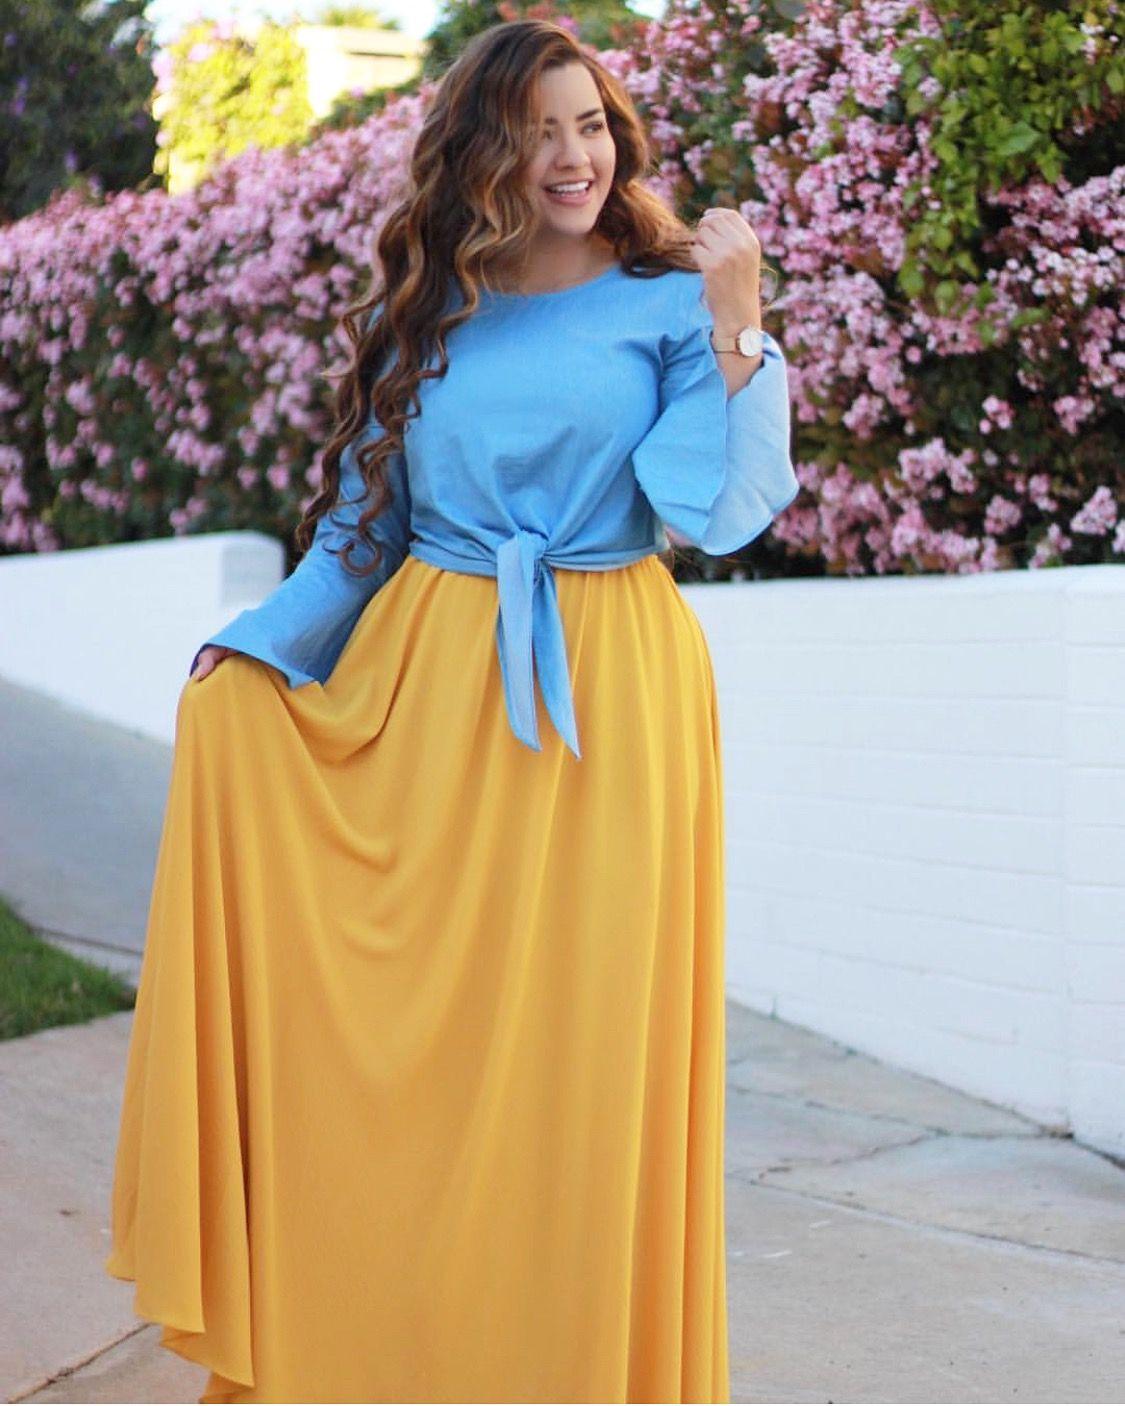 d89d6a5952c2 yellow maxi skirt, flowy maxi skirt, long skirt, plus size blogger,  @skirtsociety, Los Angeles blogger